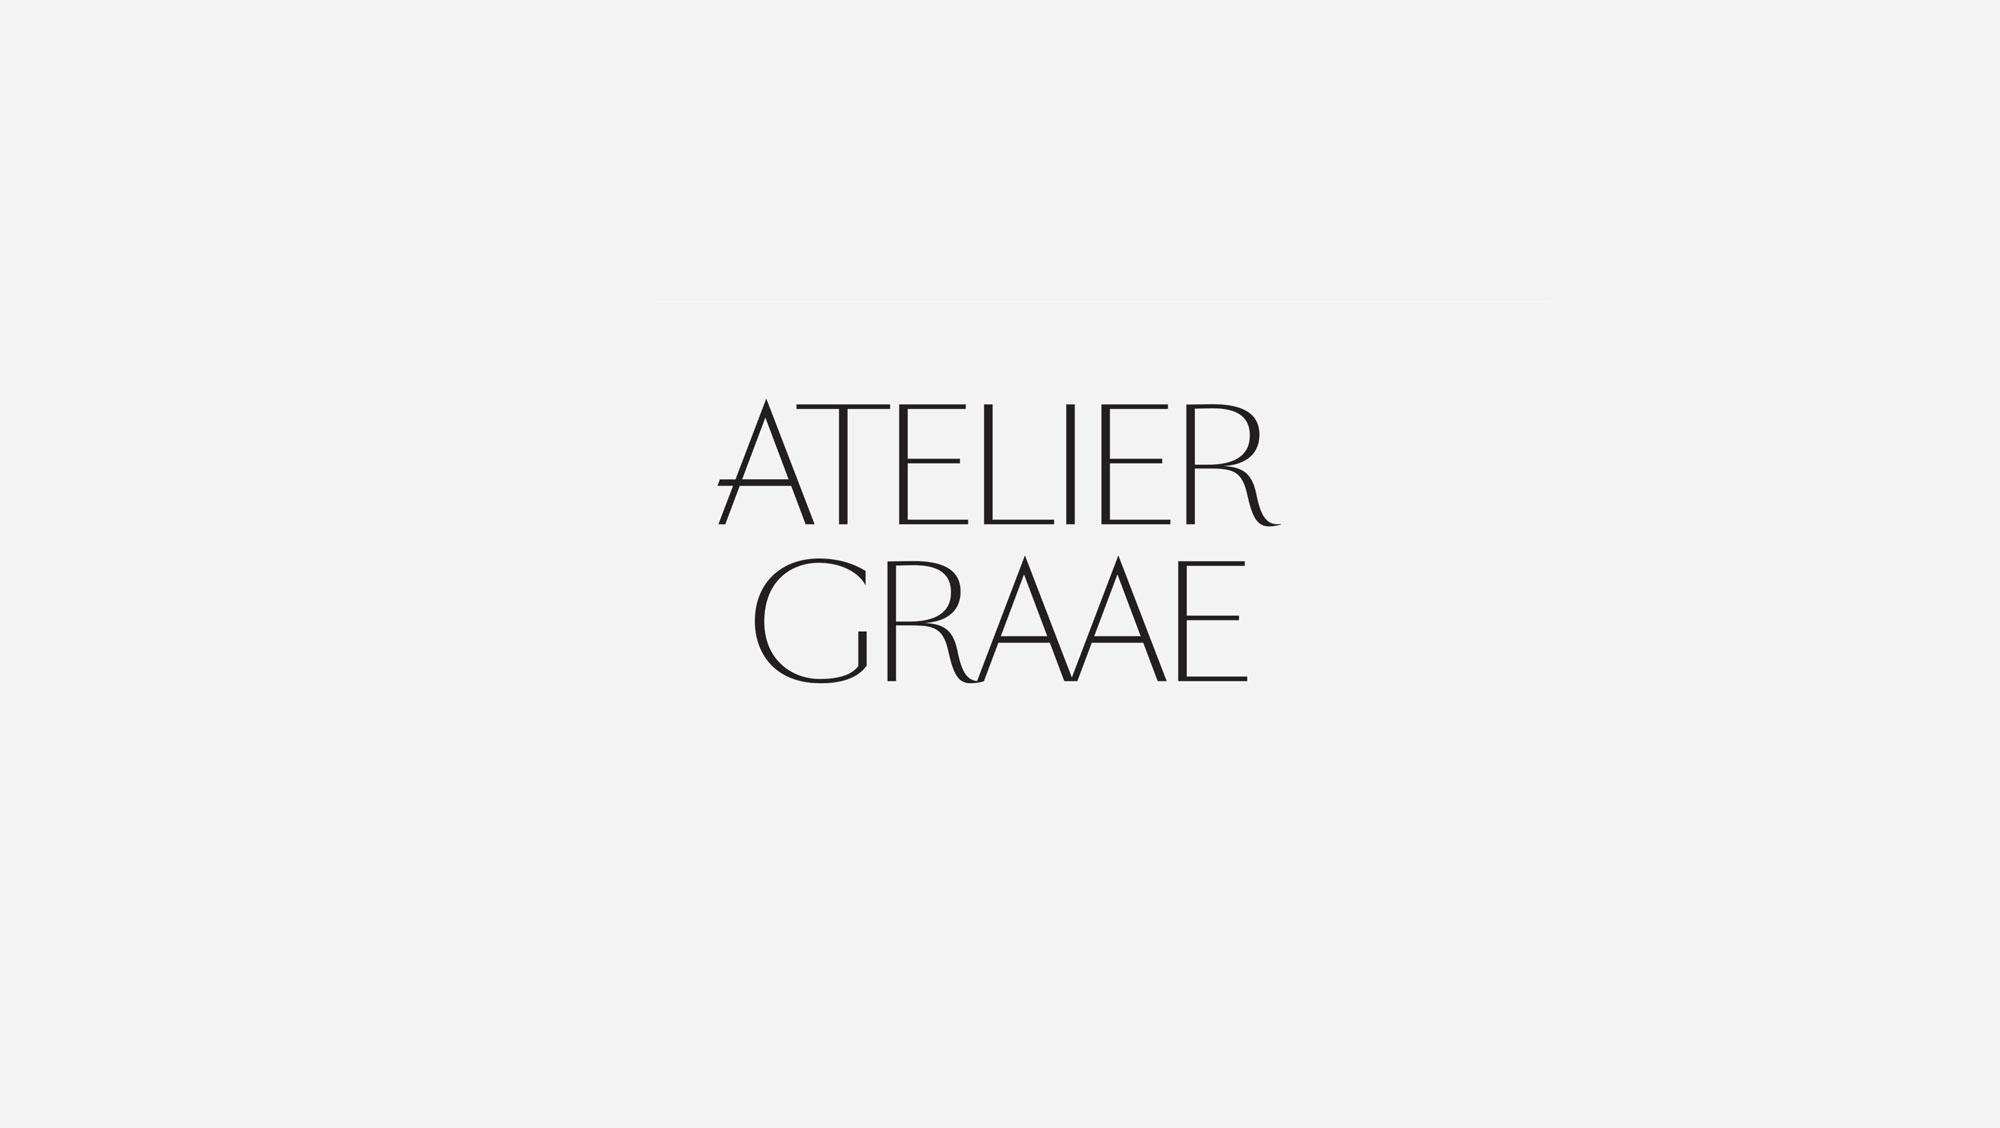 Fuhr_Studio_Design_og_branding_bureau_Atelier_Graae_Visuel_Identitet_01.jpg